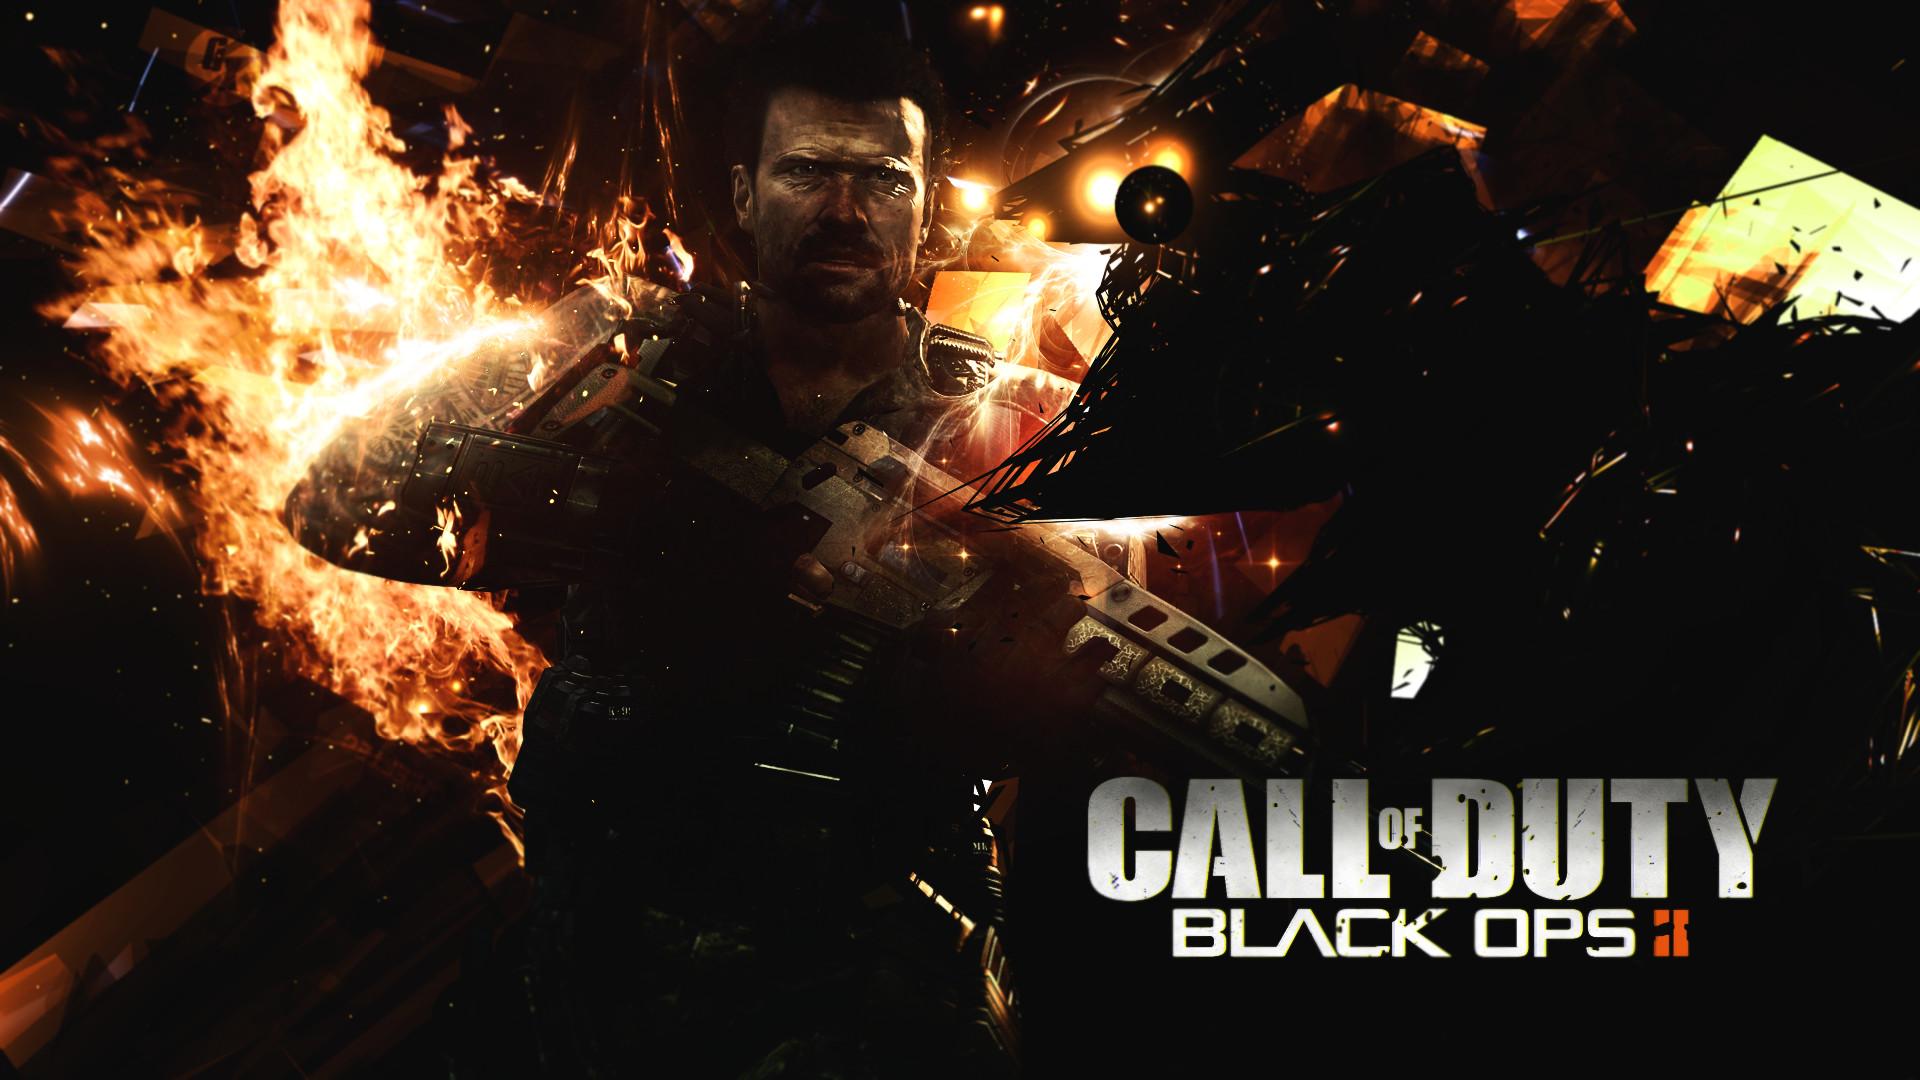 call of duty black ops 2 zombies wallpaper ✓ best hd wallpaper